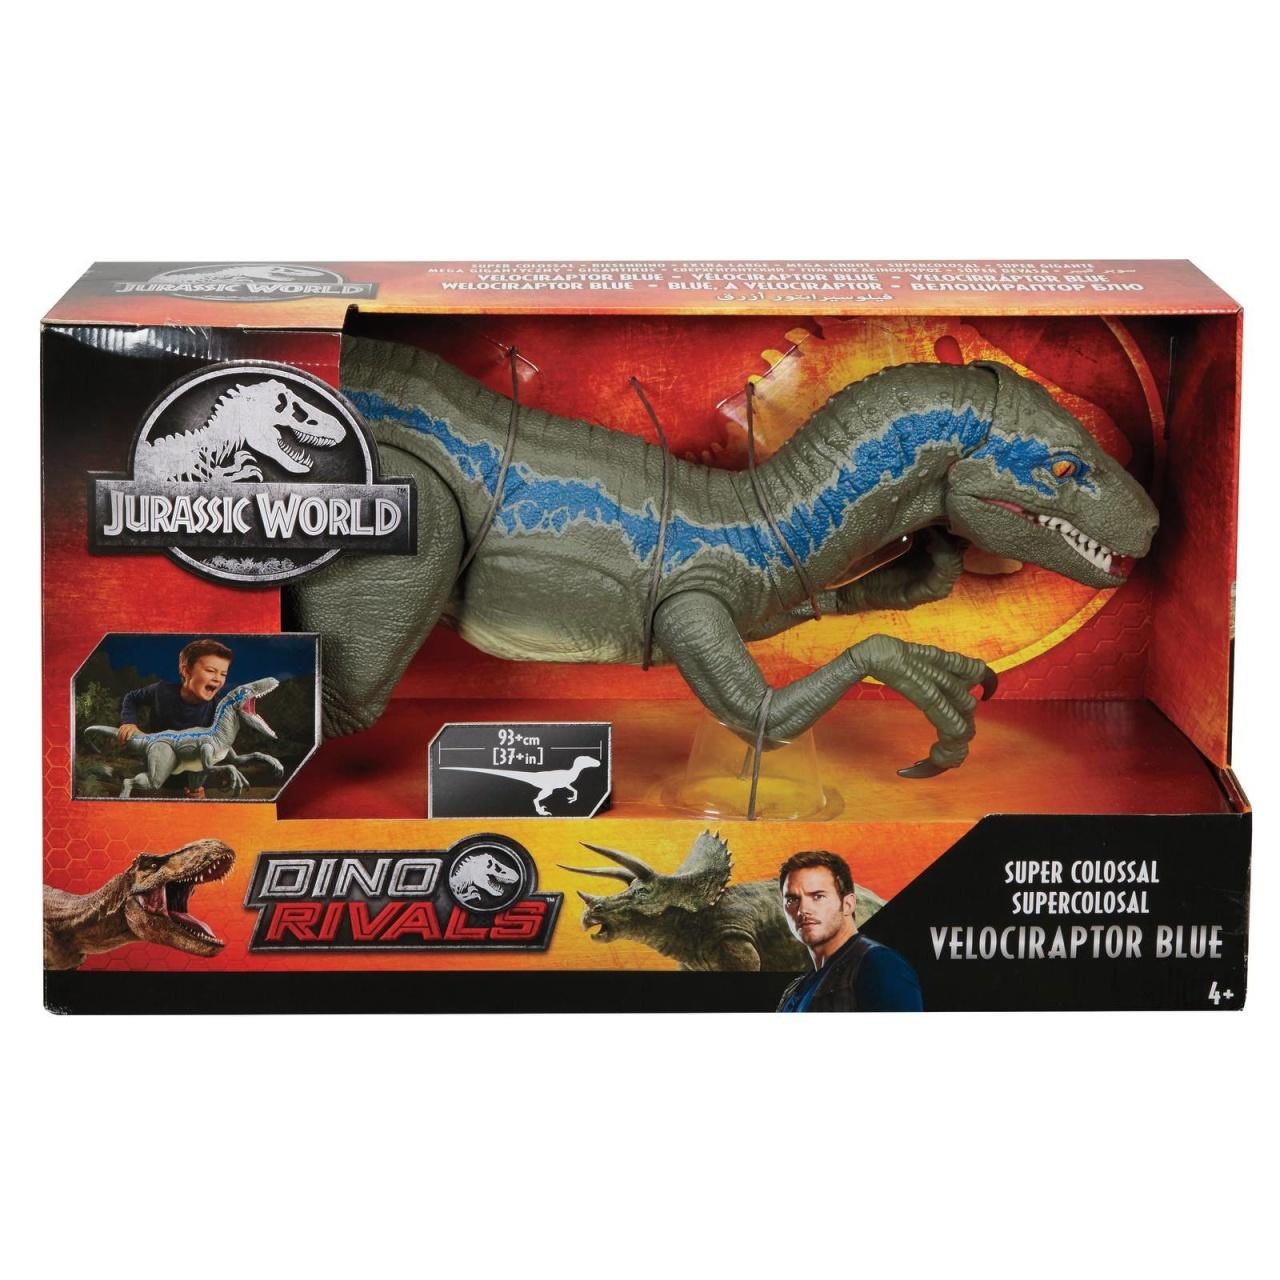 Jurassic World Super Colossal XXL Veliociraptor Blue Dino